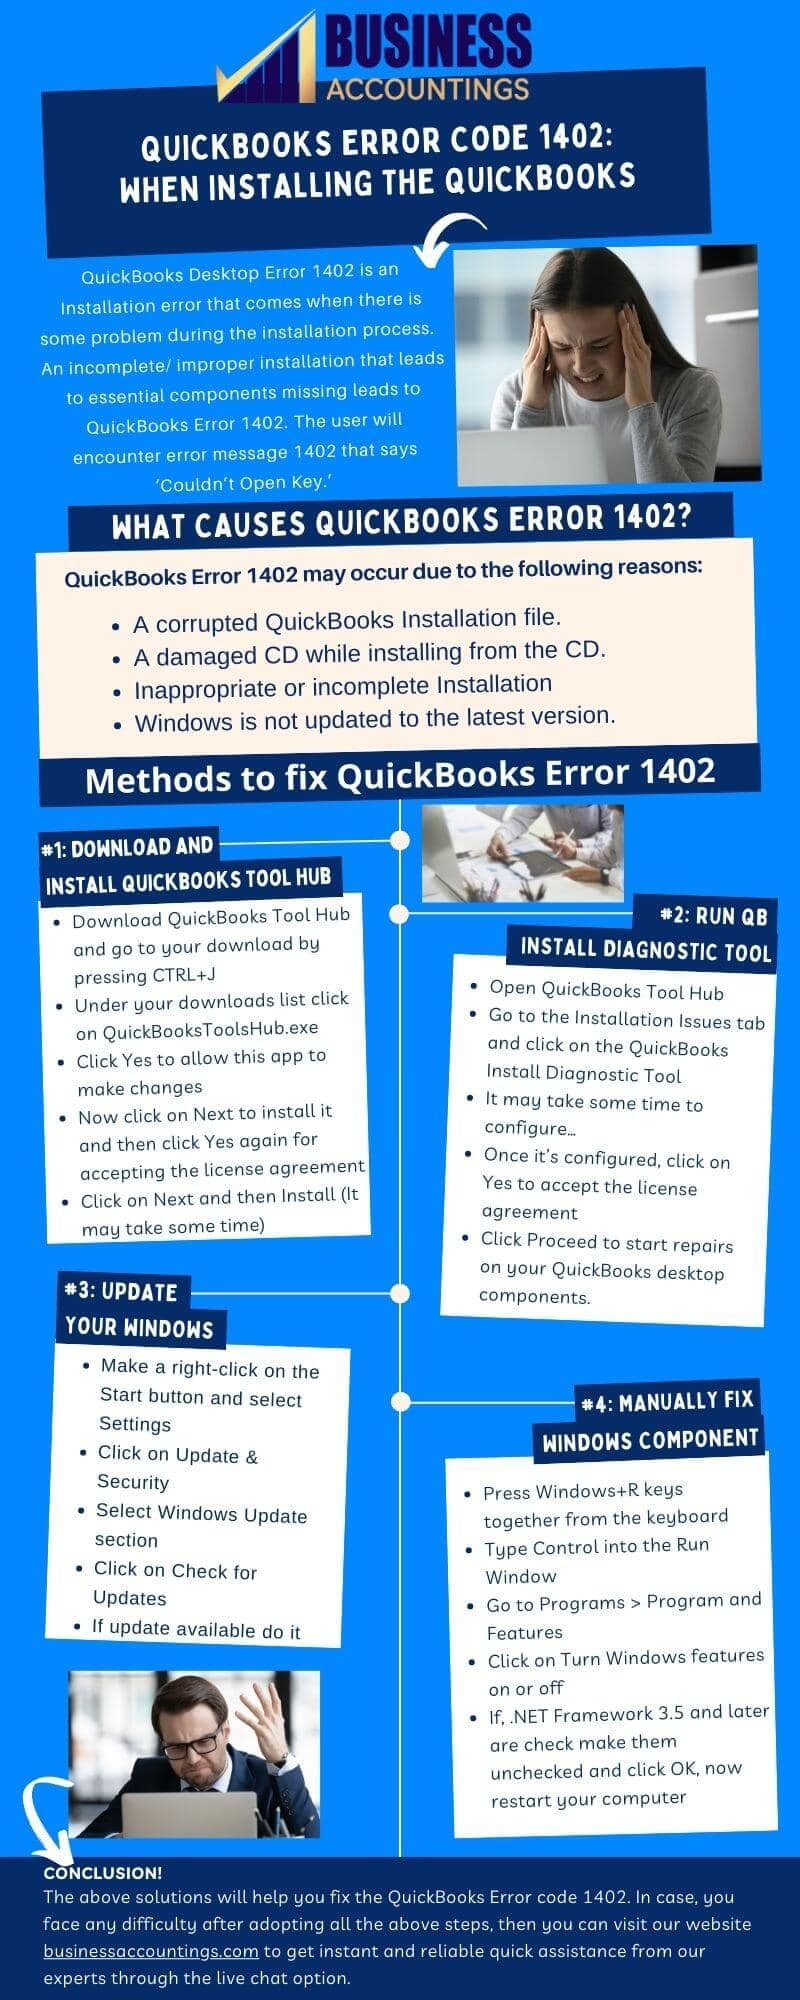 Infographic To Resolve QuickBooks Error Code 1402